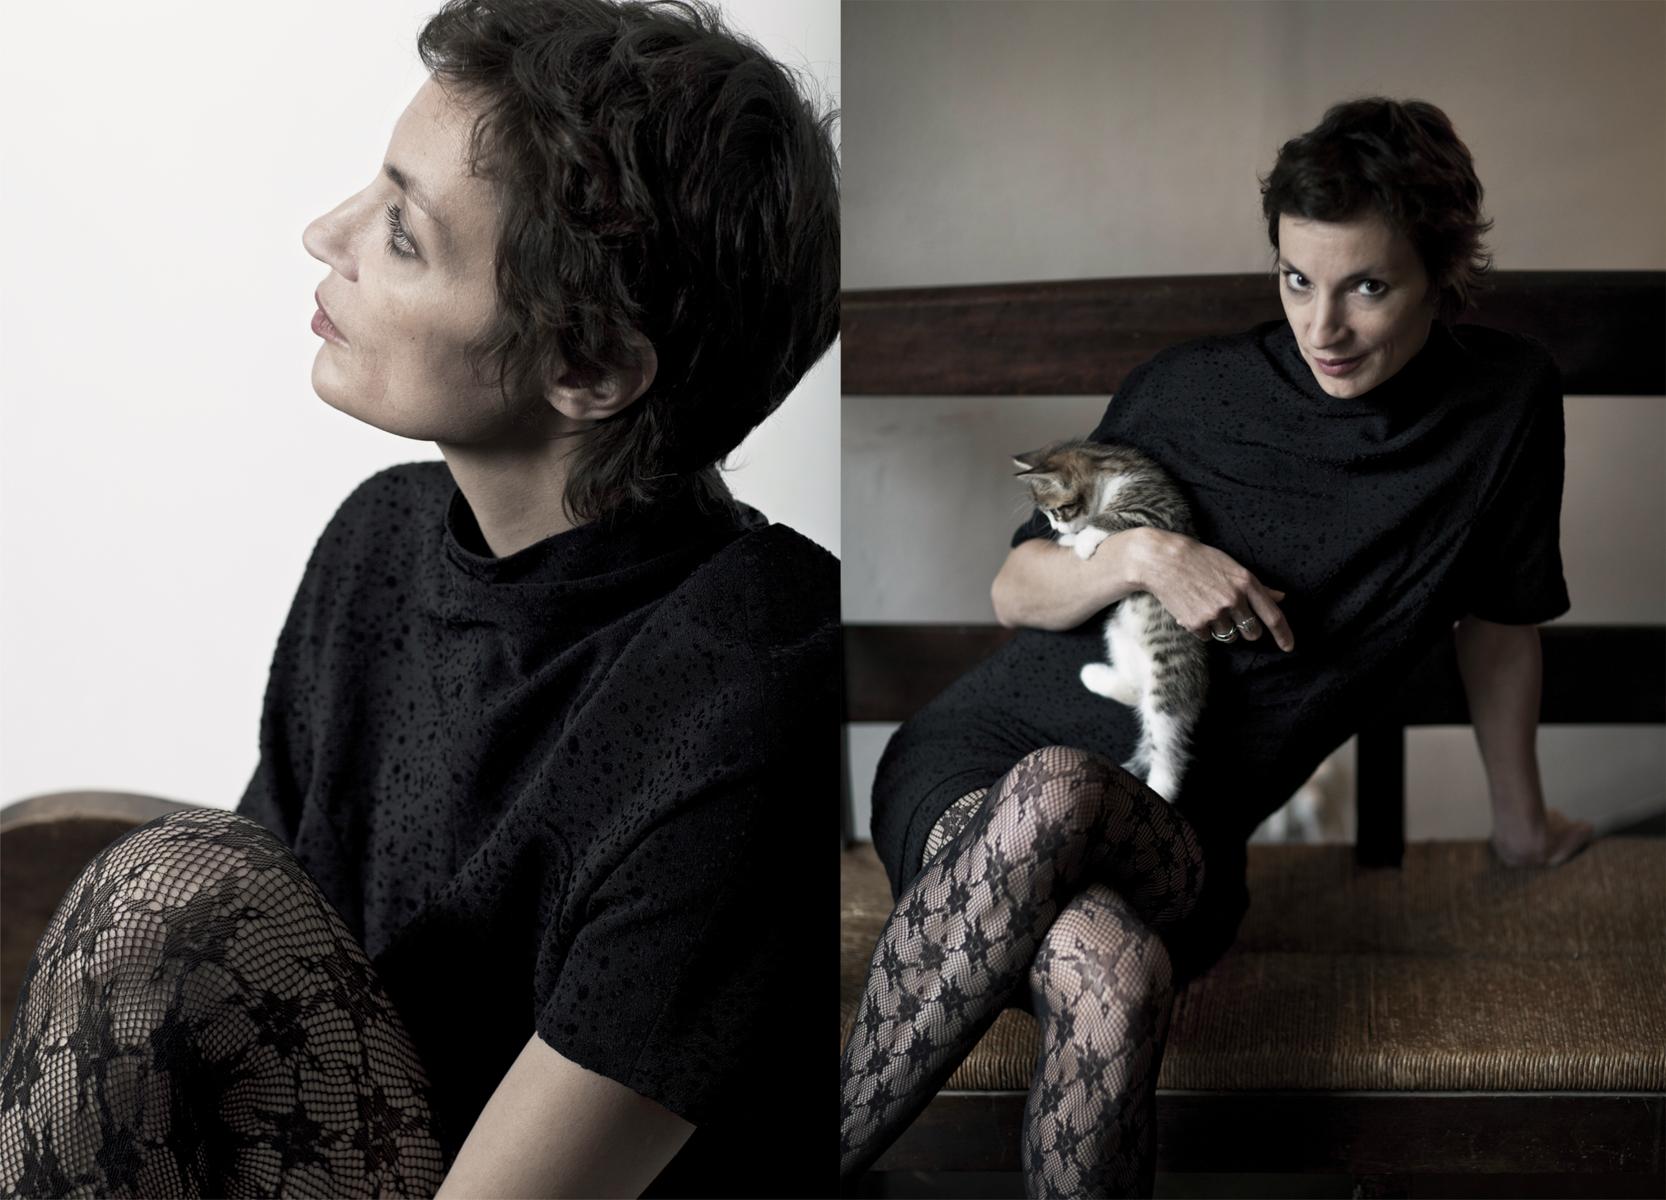 jeanne balibar, paris 2011